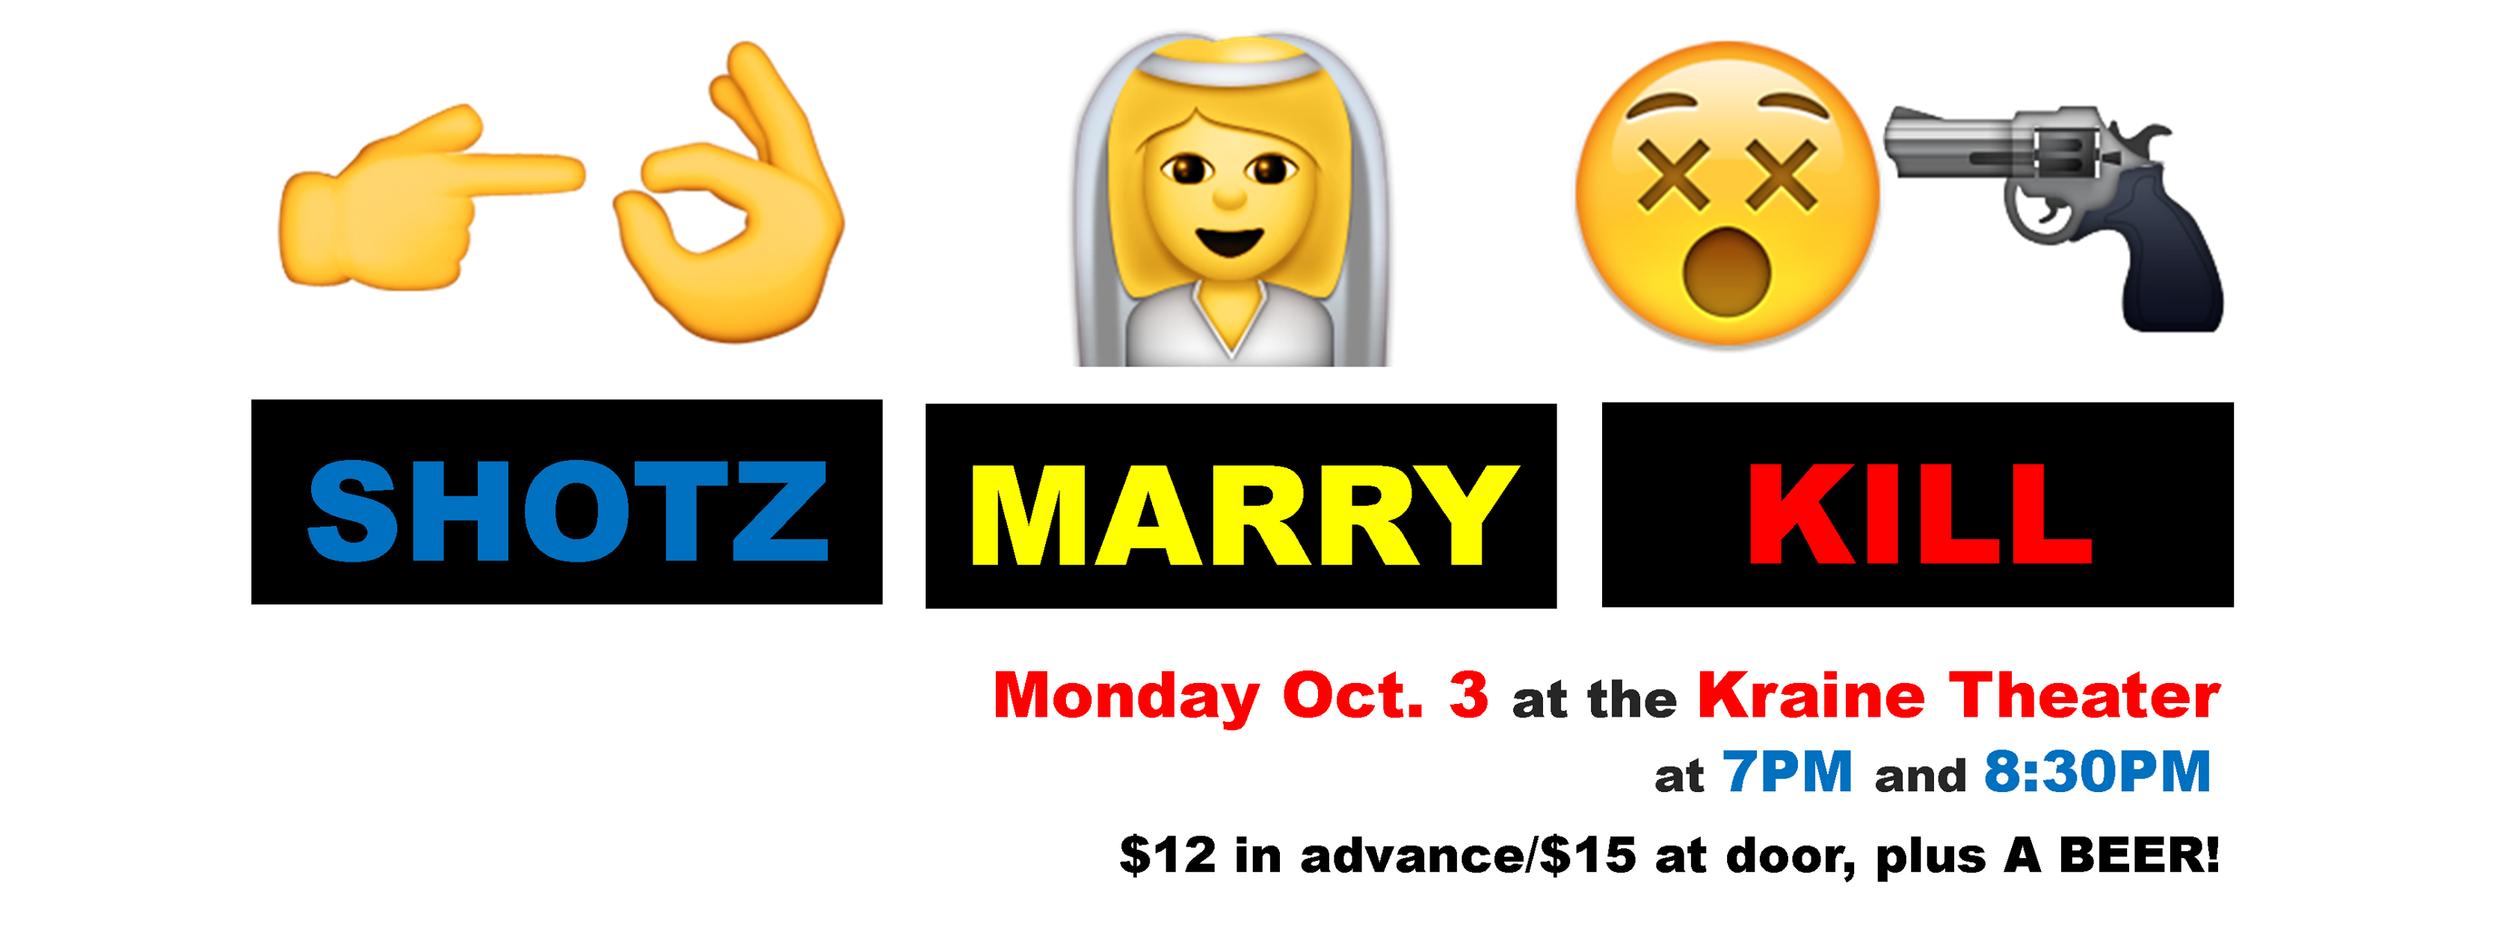 AG shotz marry kill.png